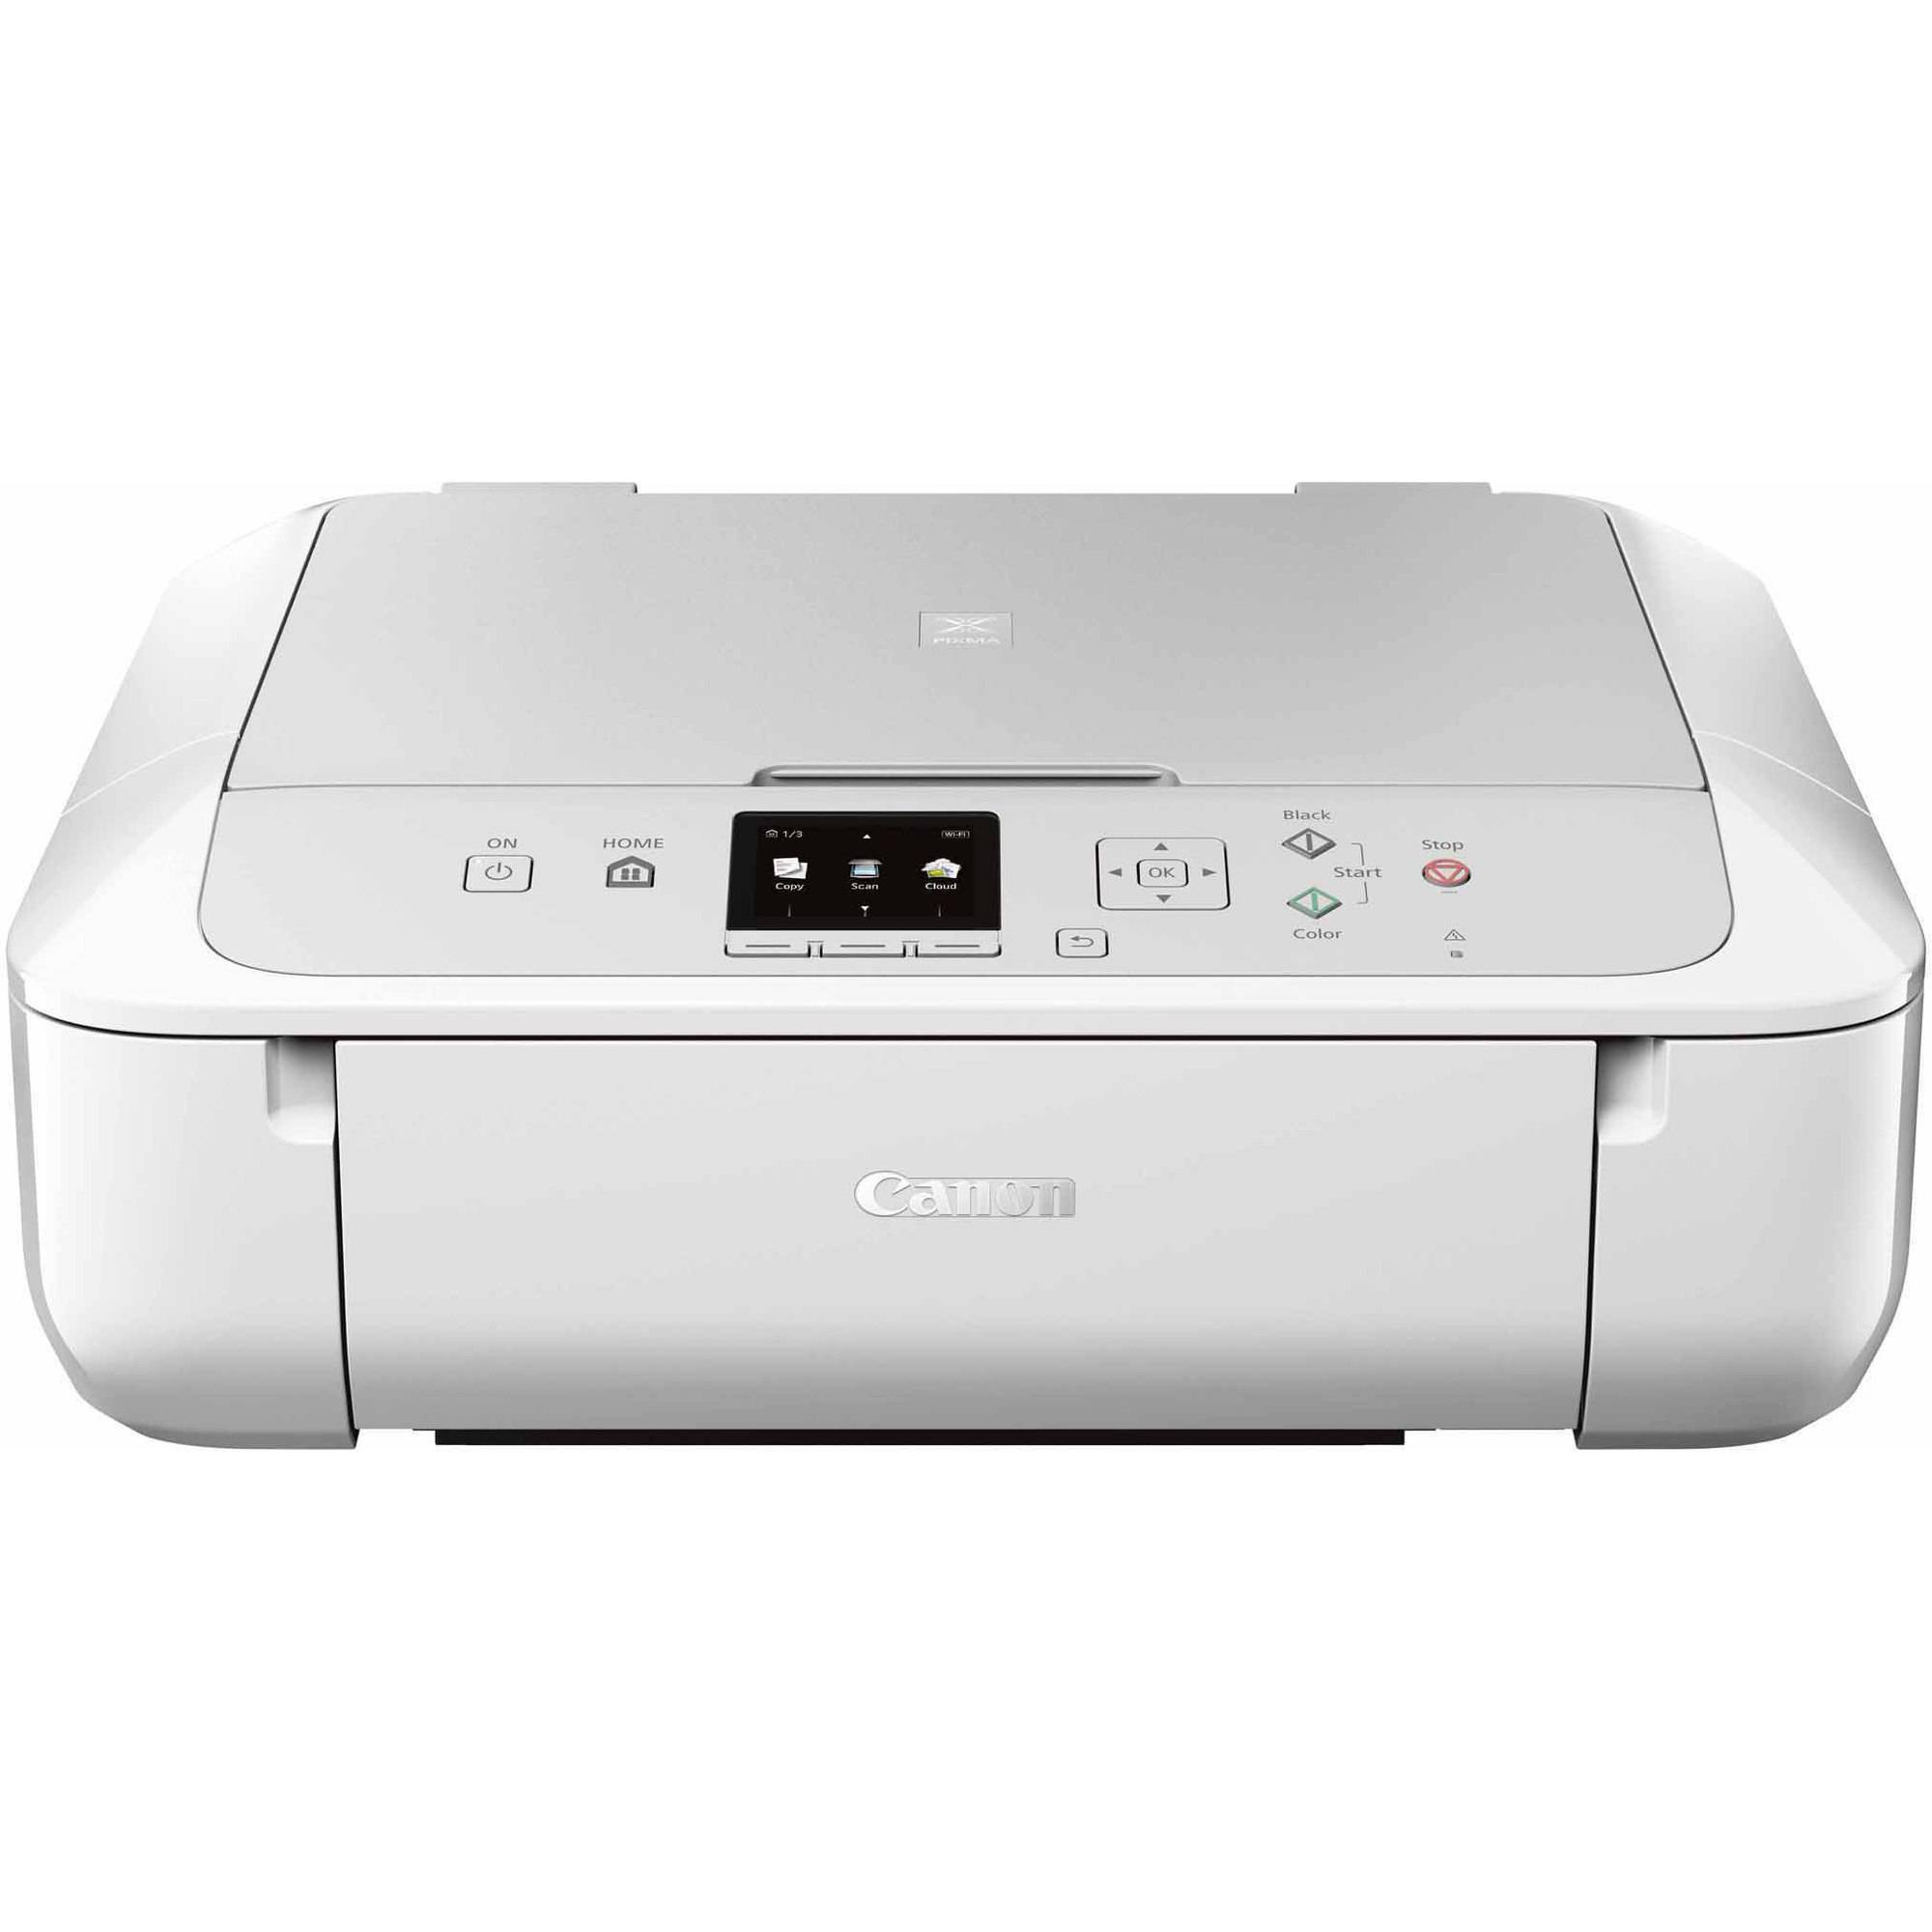 Canon PIXMA MG5720 Wireless Inkjet All-in-One Printer/Copier/Scanner